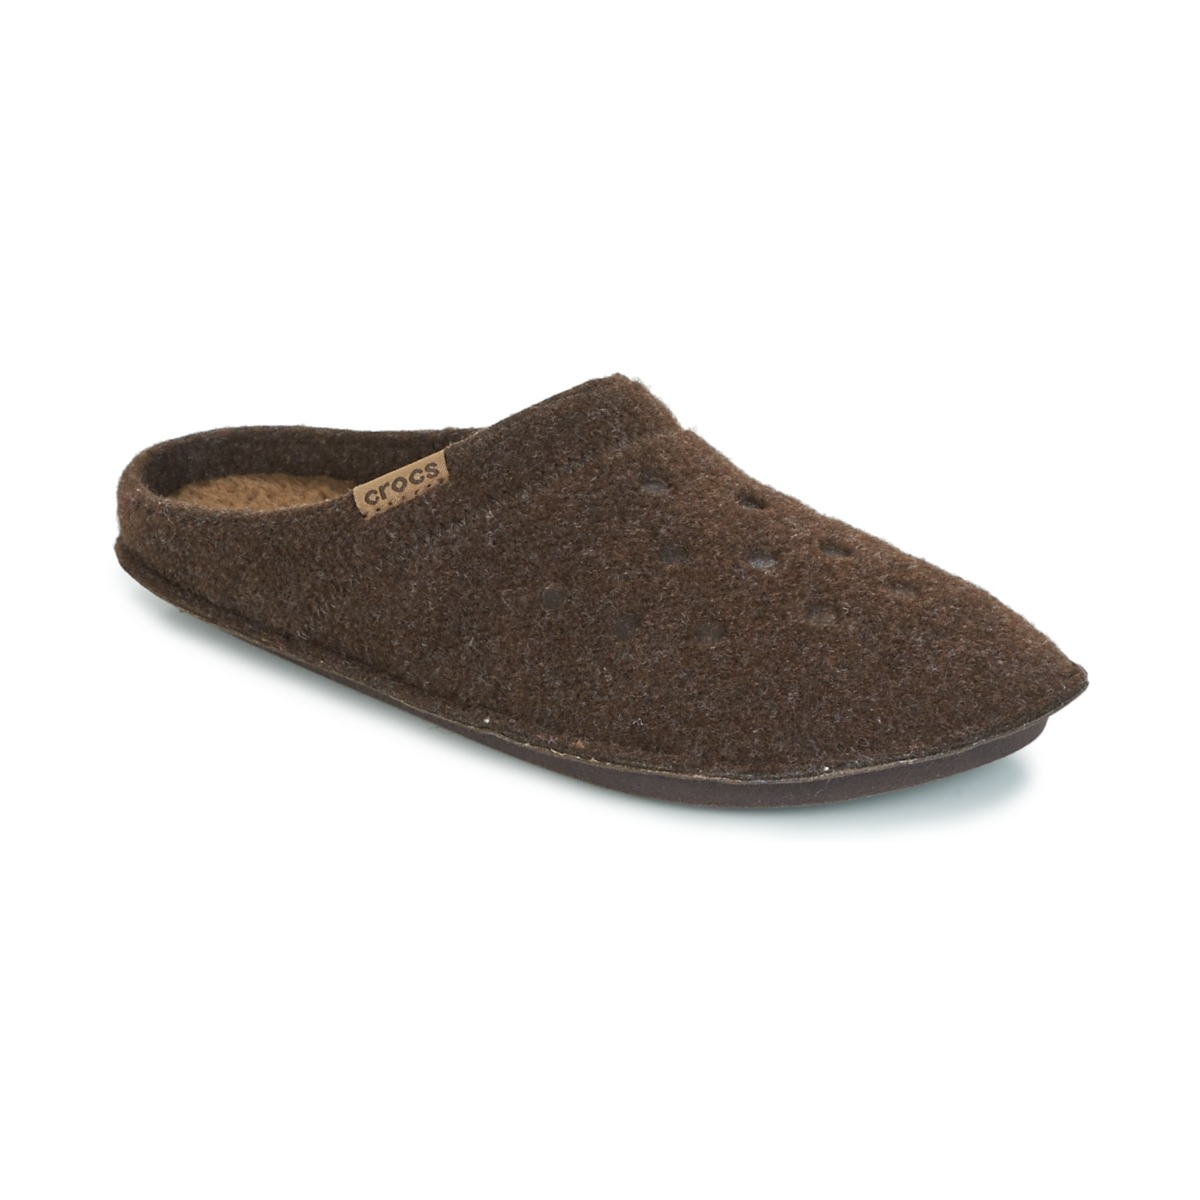 Sko Crocs  CLASSIC SLIPPER